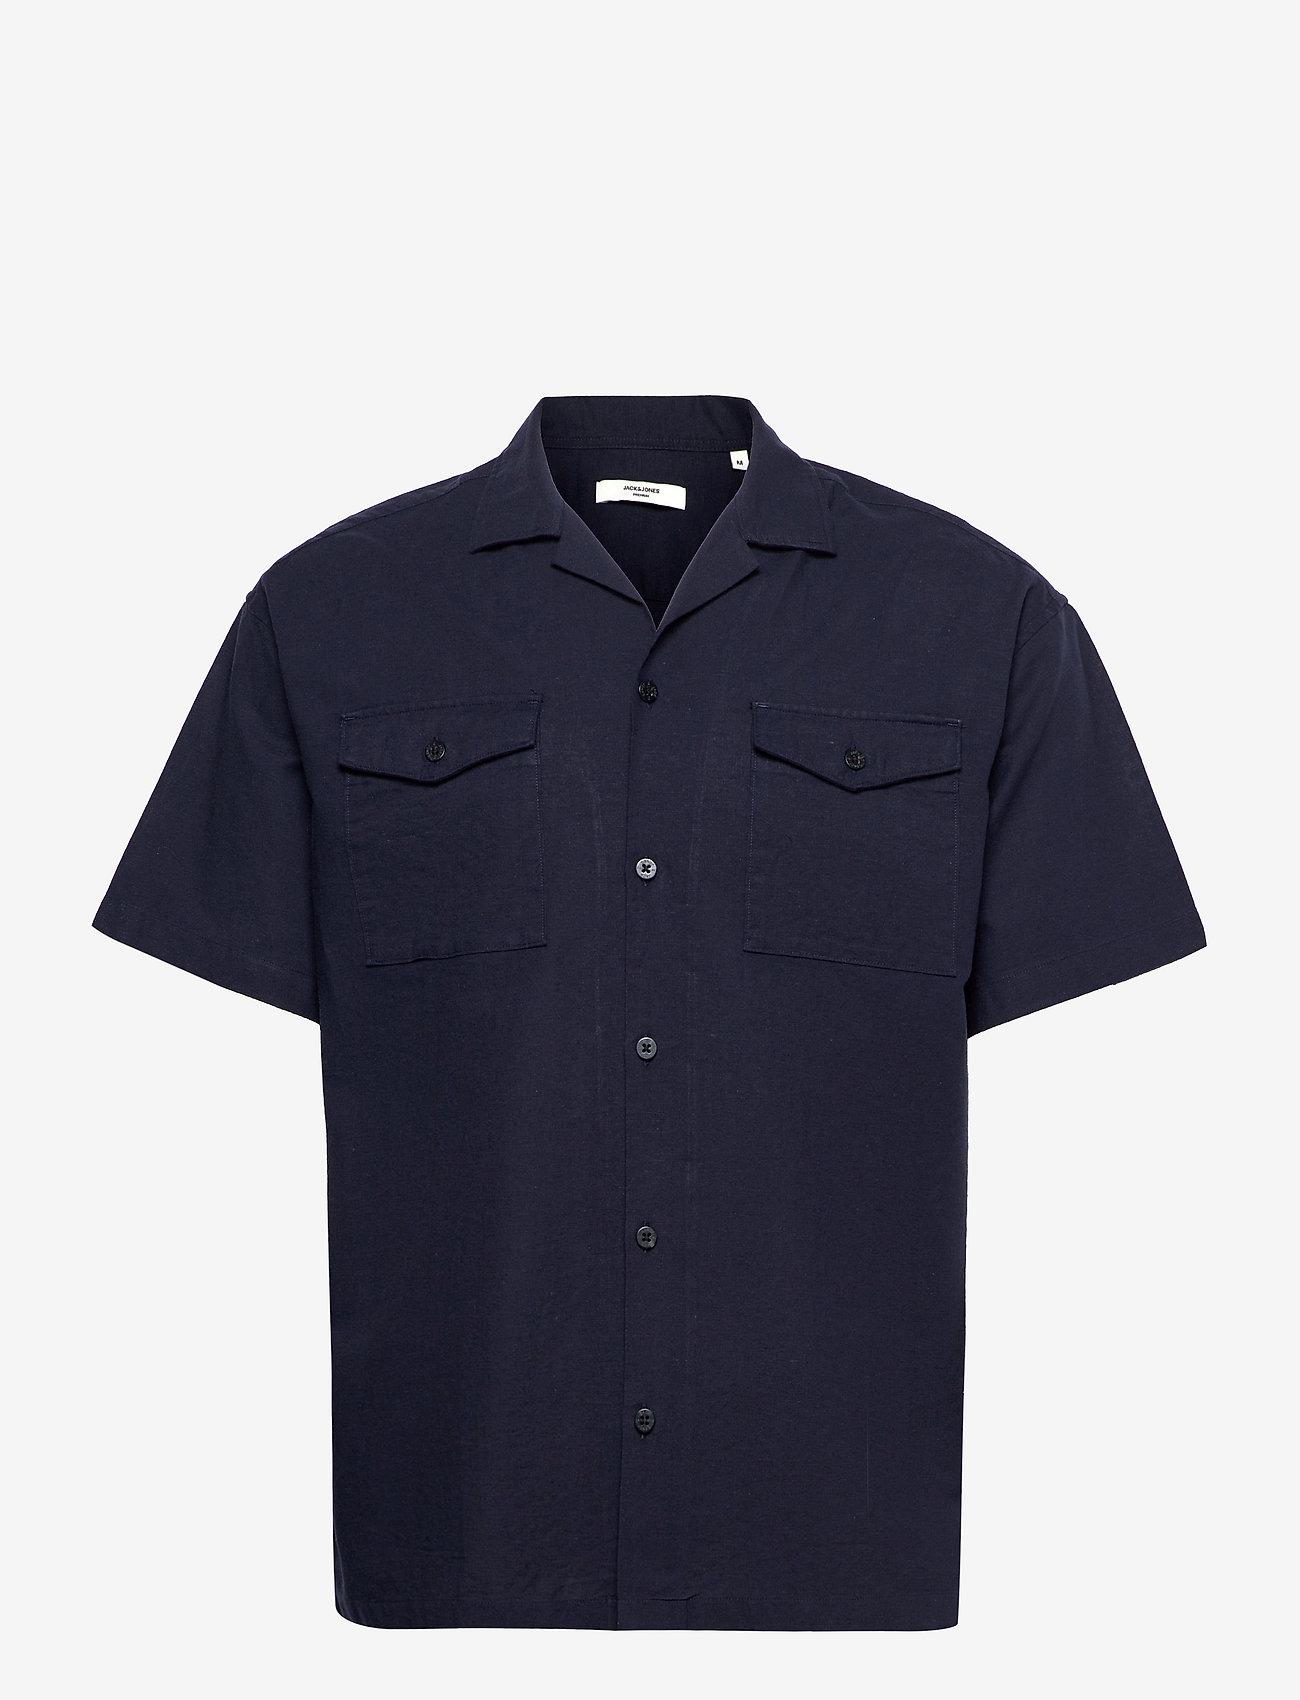 Jack & Jones - JPRBLASUMMER POCKET RESORT SHIRT S/S - basic skjortor - navy blazer - 0